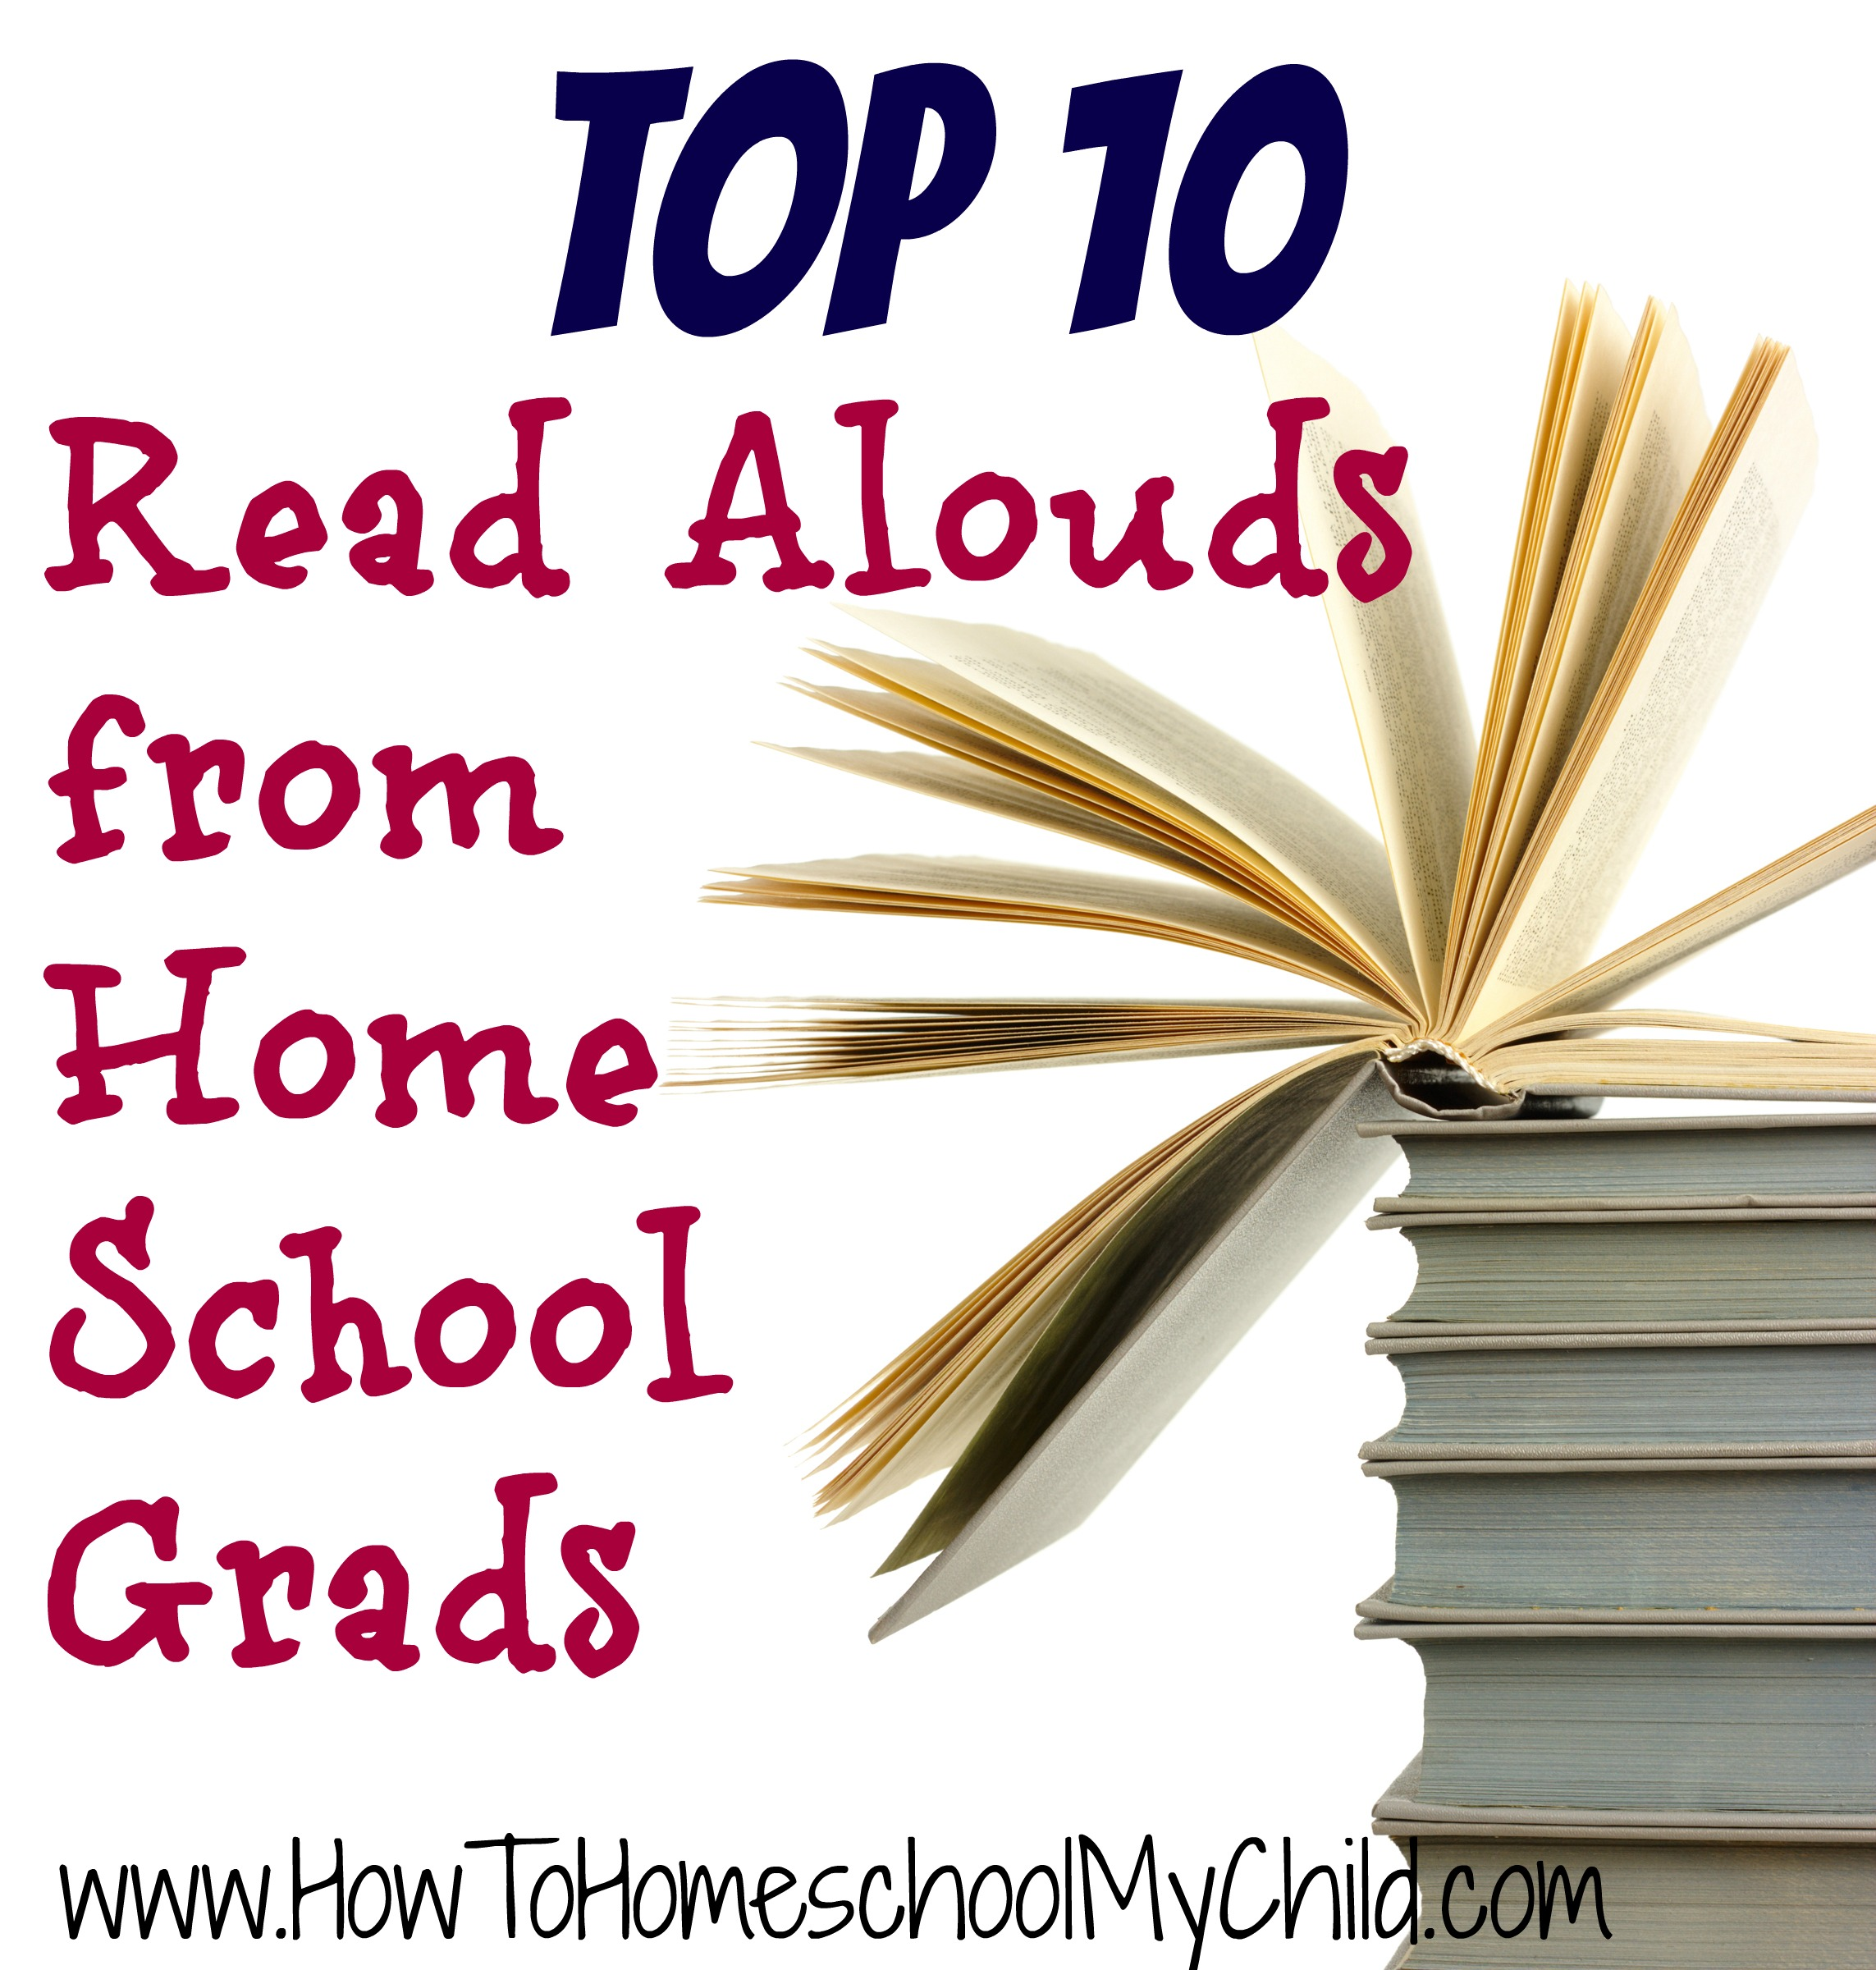 Top 10 Favorite Read Alouds From Homeschool Grads